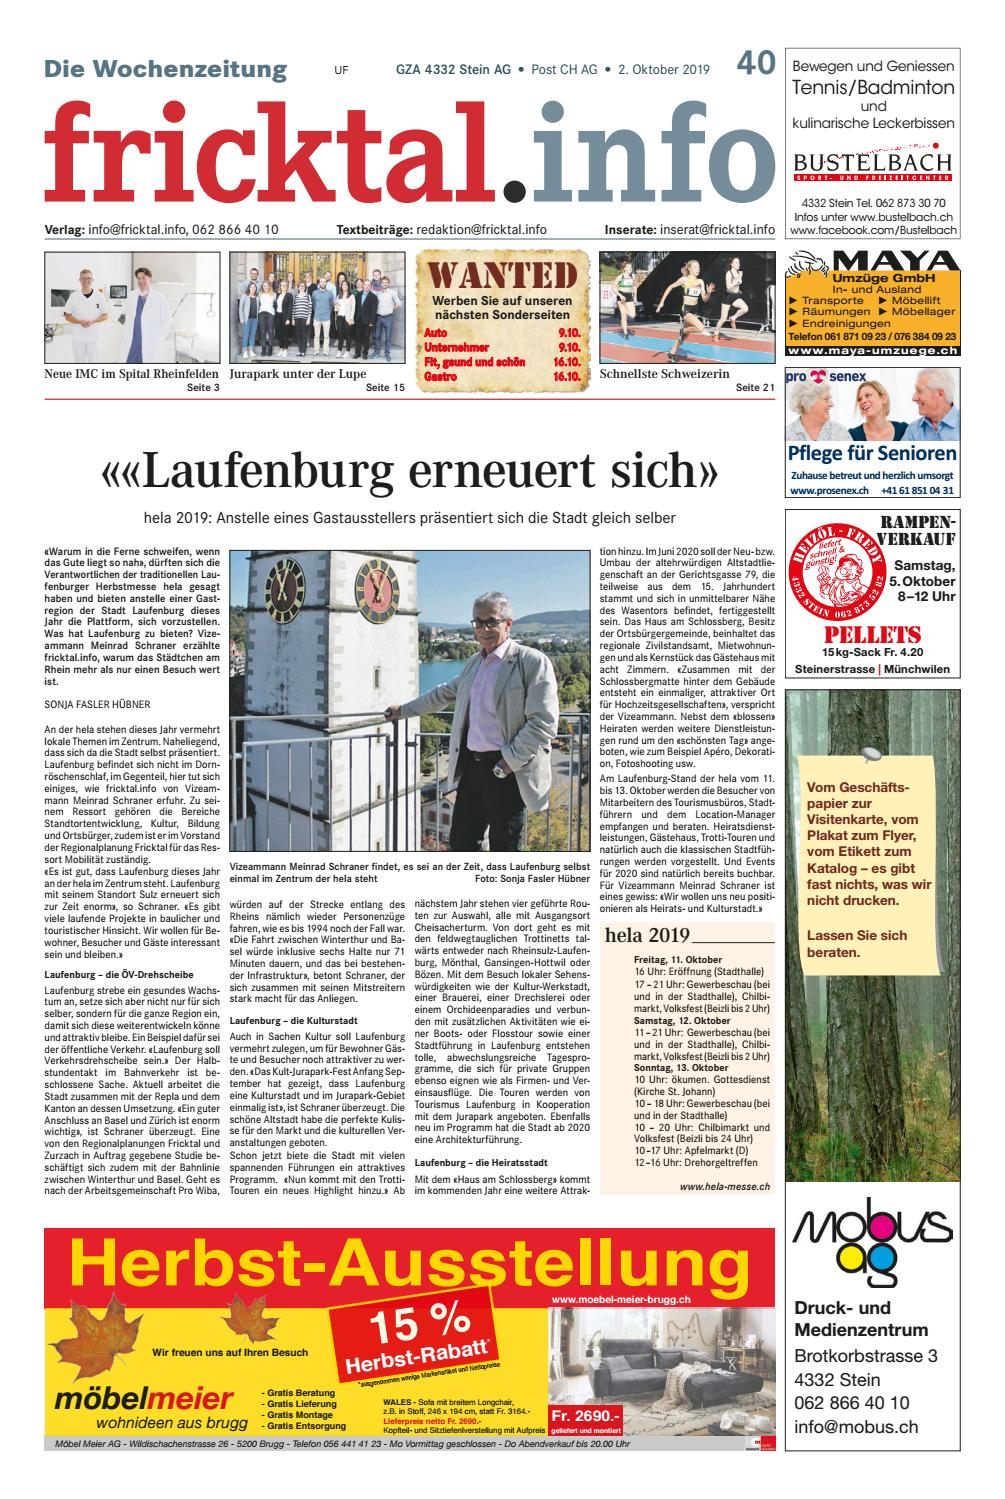 Barni-Post, KW 39, 24. September 2014 by Barni-Post - Issuu